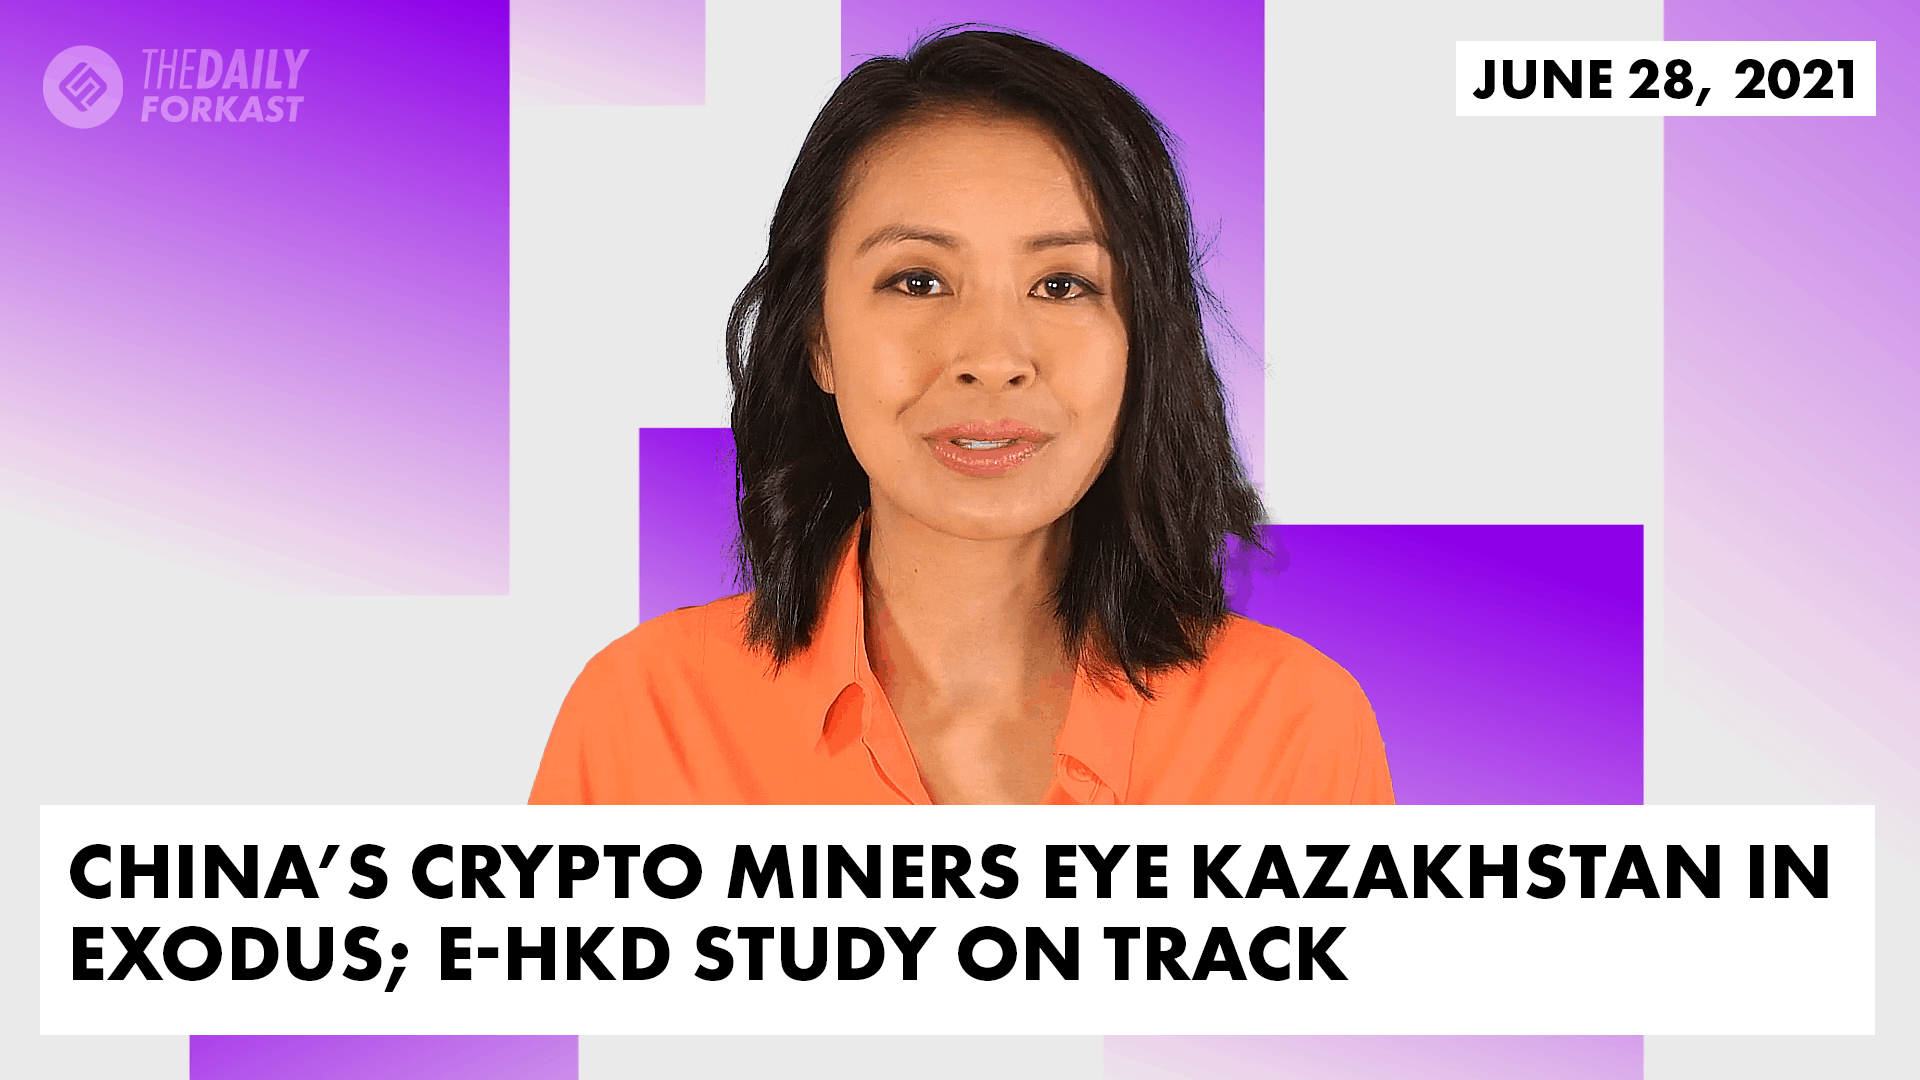 Los mineros de criptomonedas de China miran a Kazajstán en éxodo;  Estudio de e-HKD en marcha